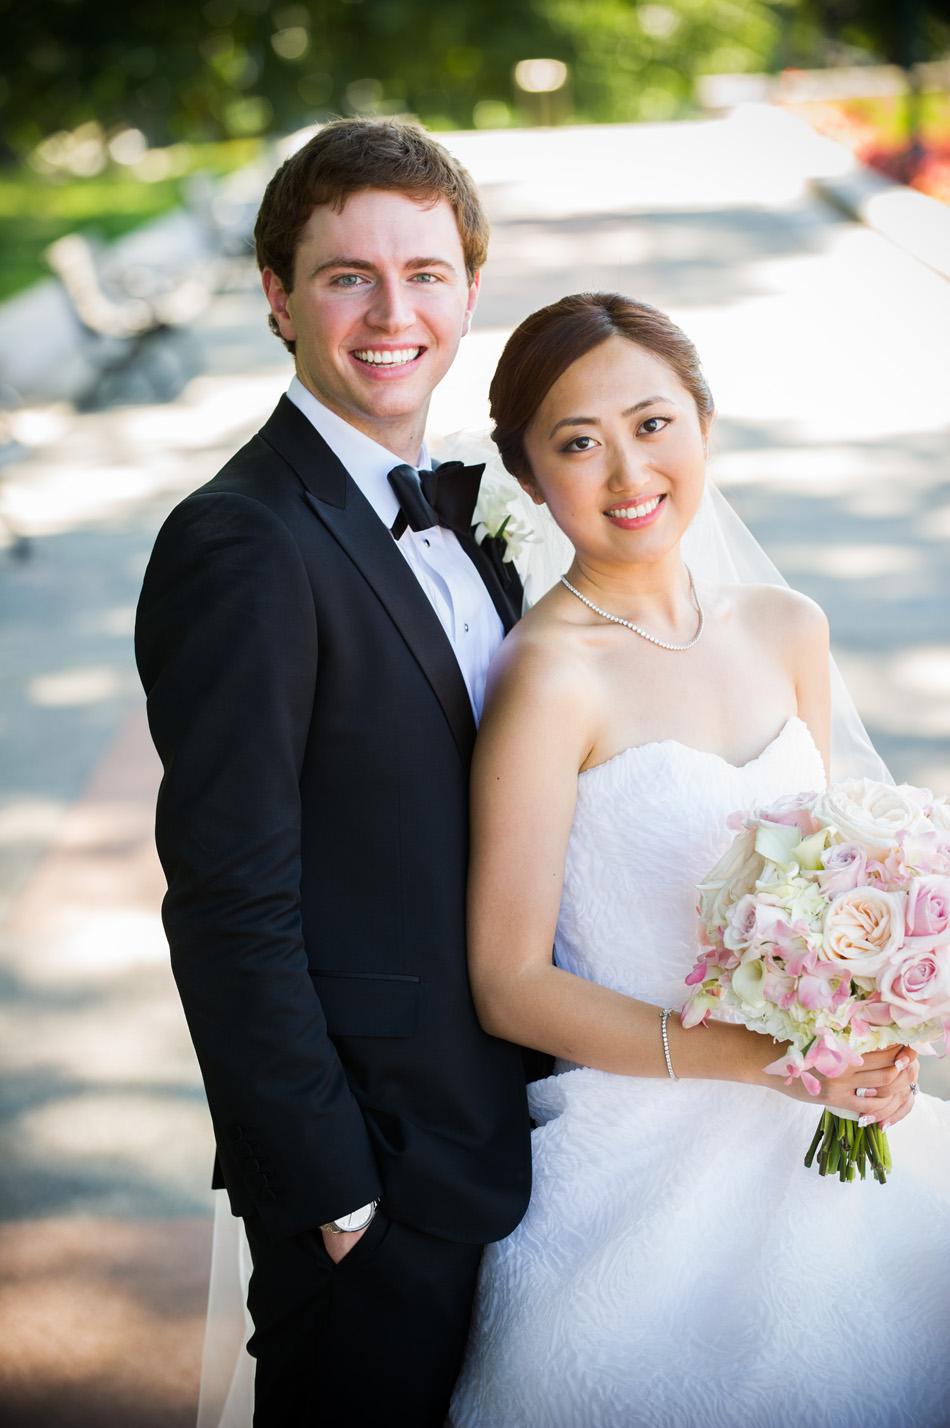 FreedPhotography_DC Wedding_020